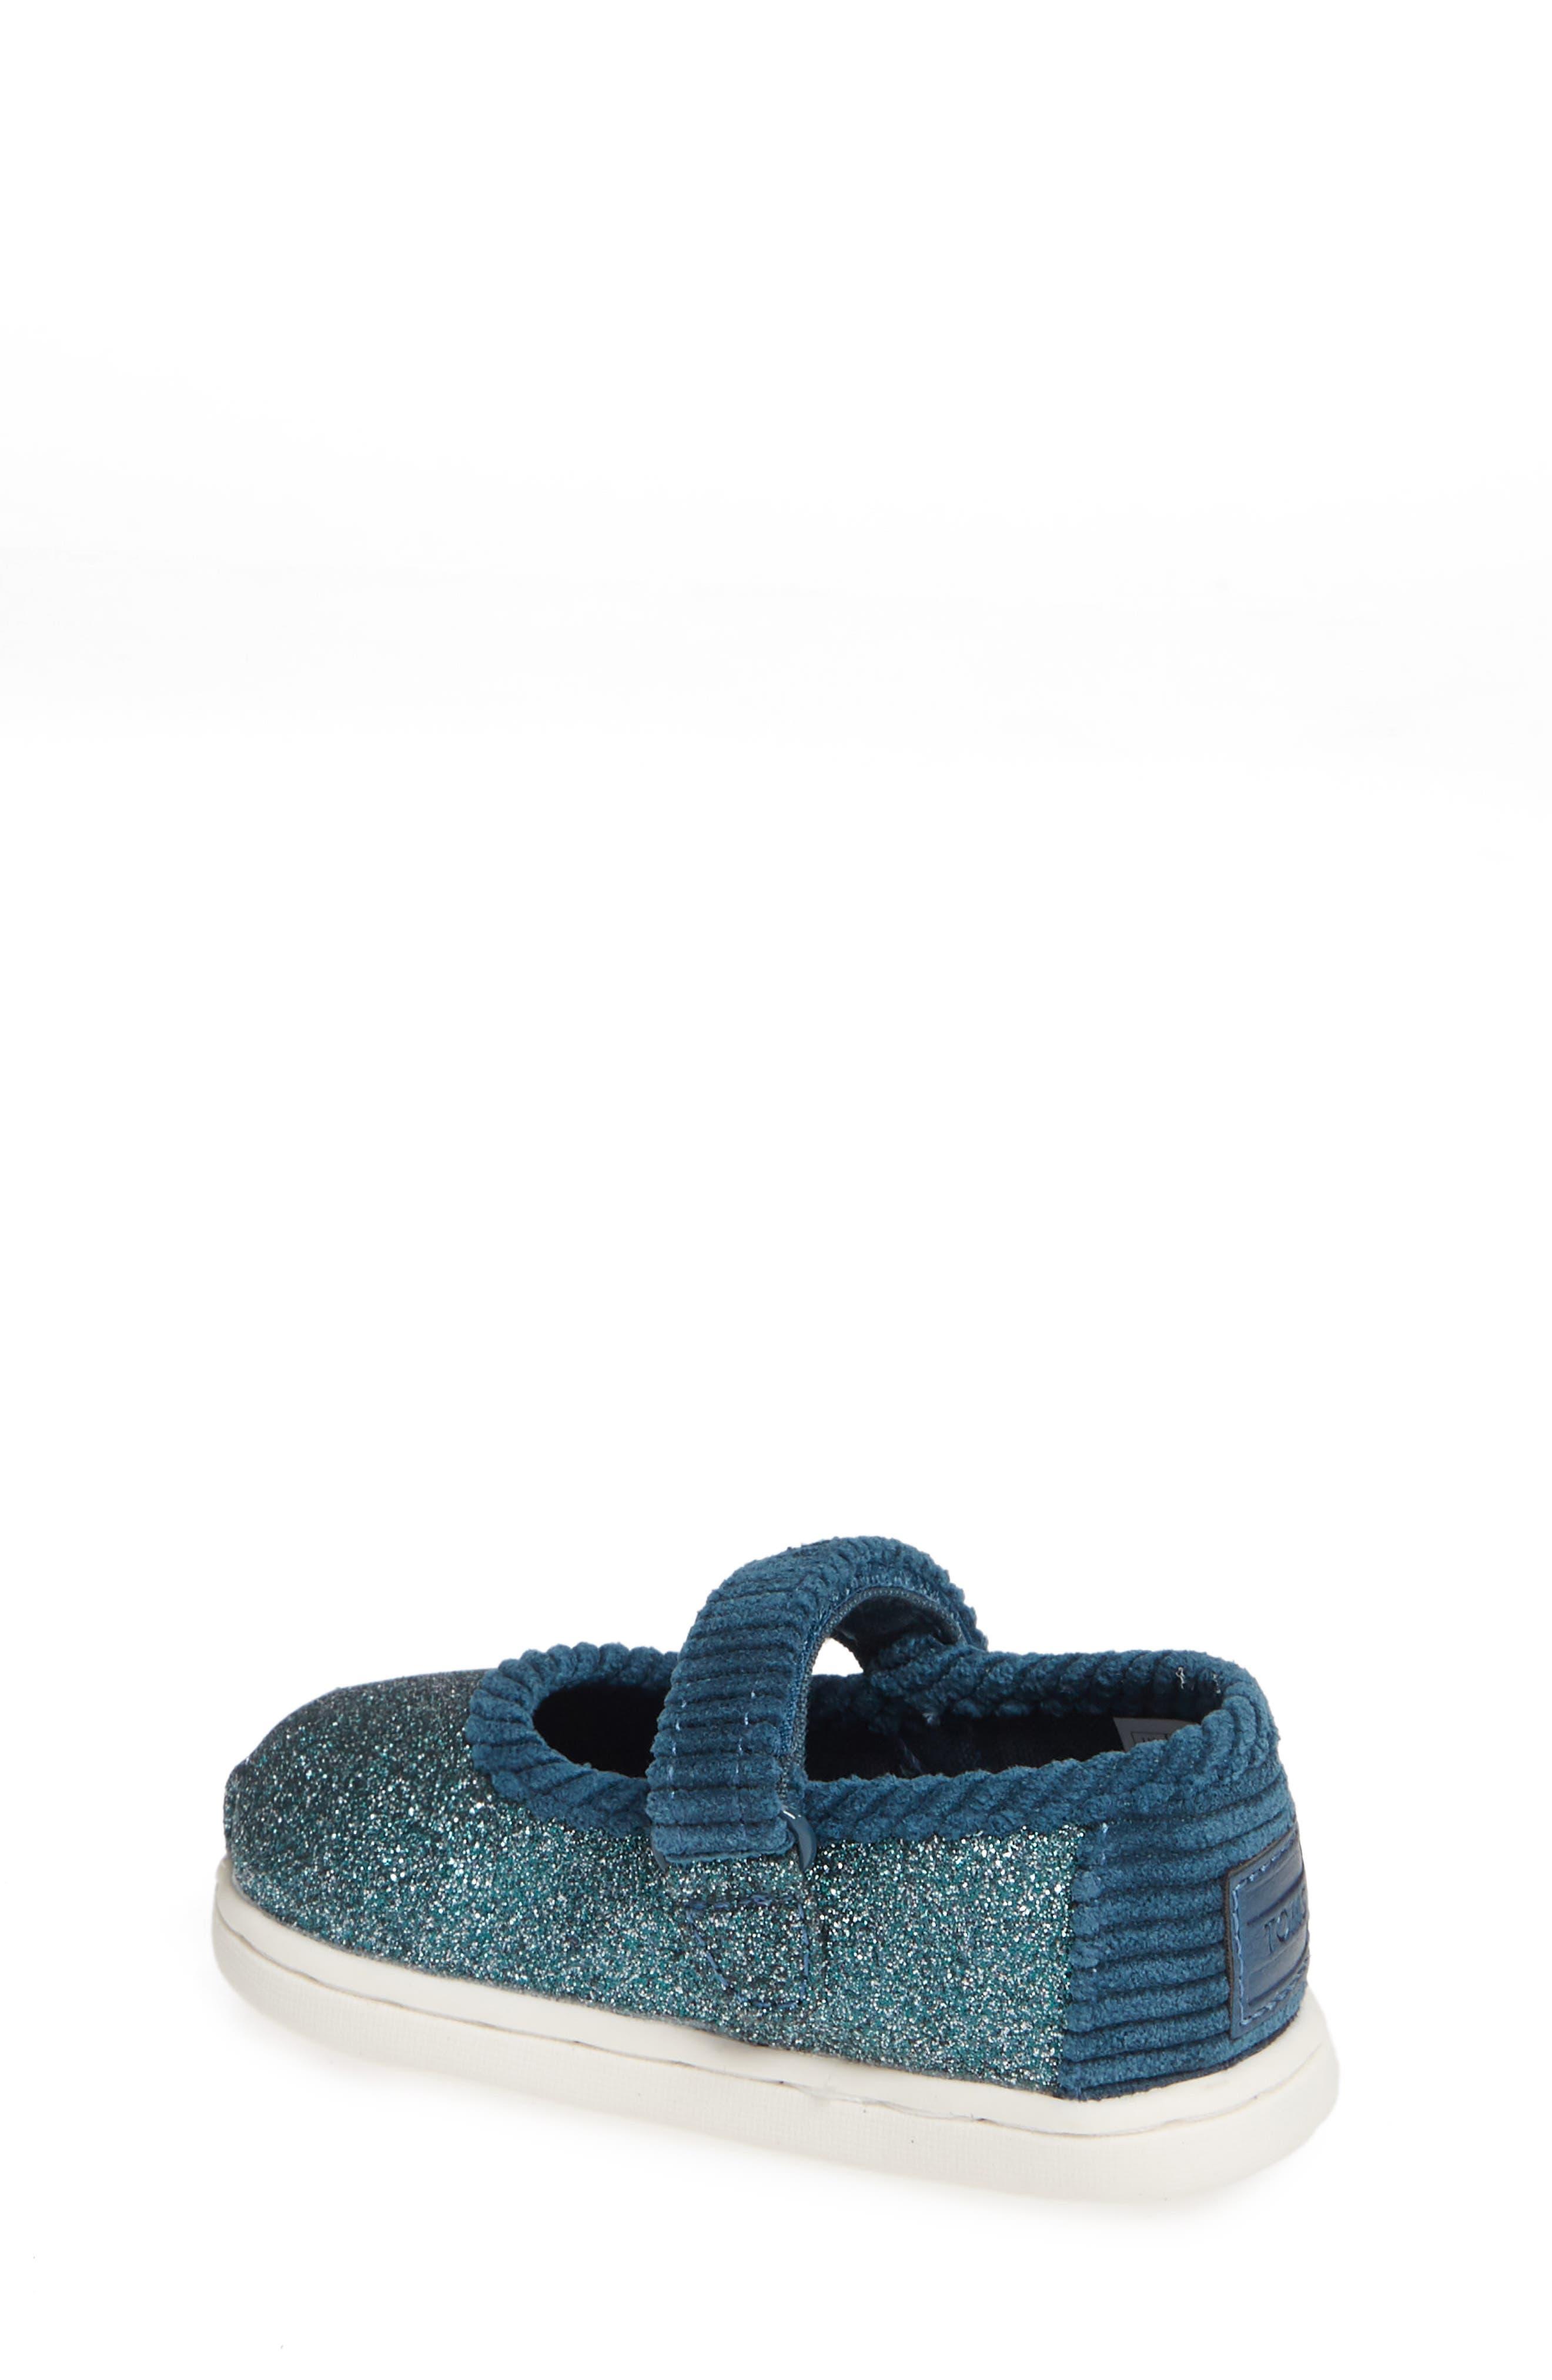 Mary Jane Sneaker,                             Alternate thumbnail 2, color,                             ATLANTIC IRIDESCENT/ CORDUROY